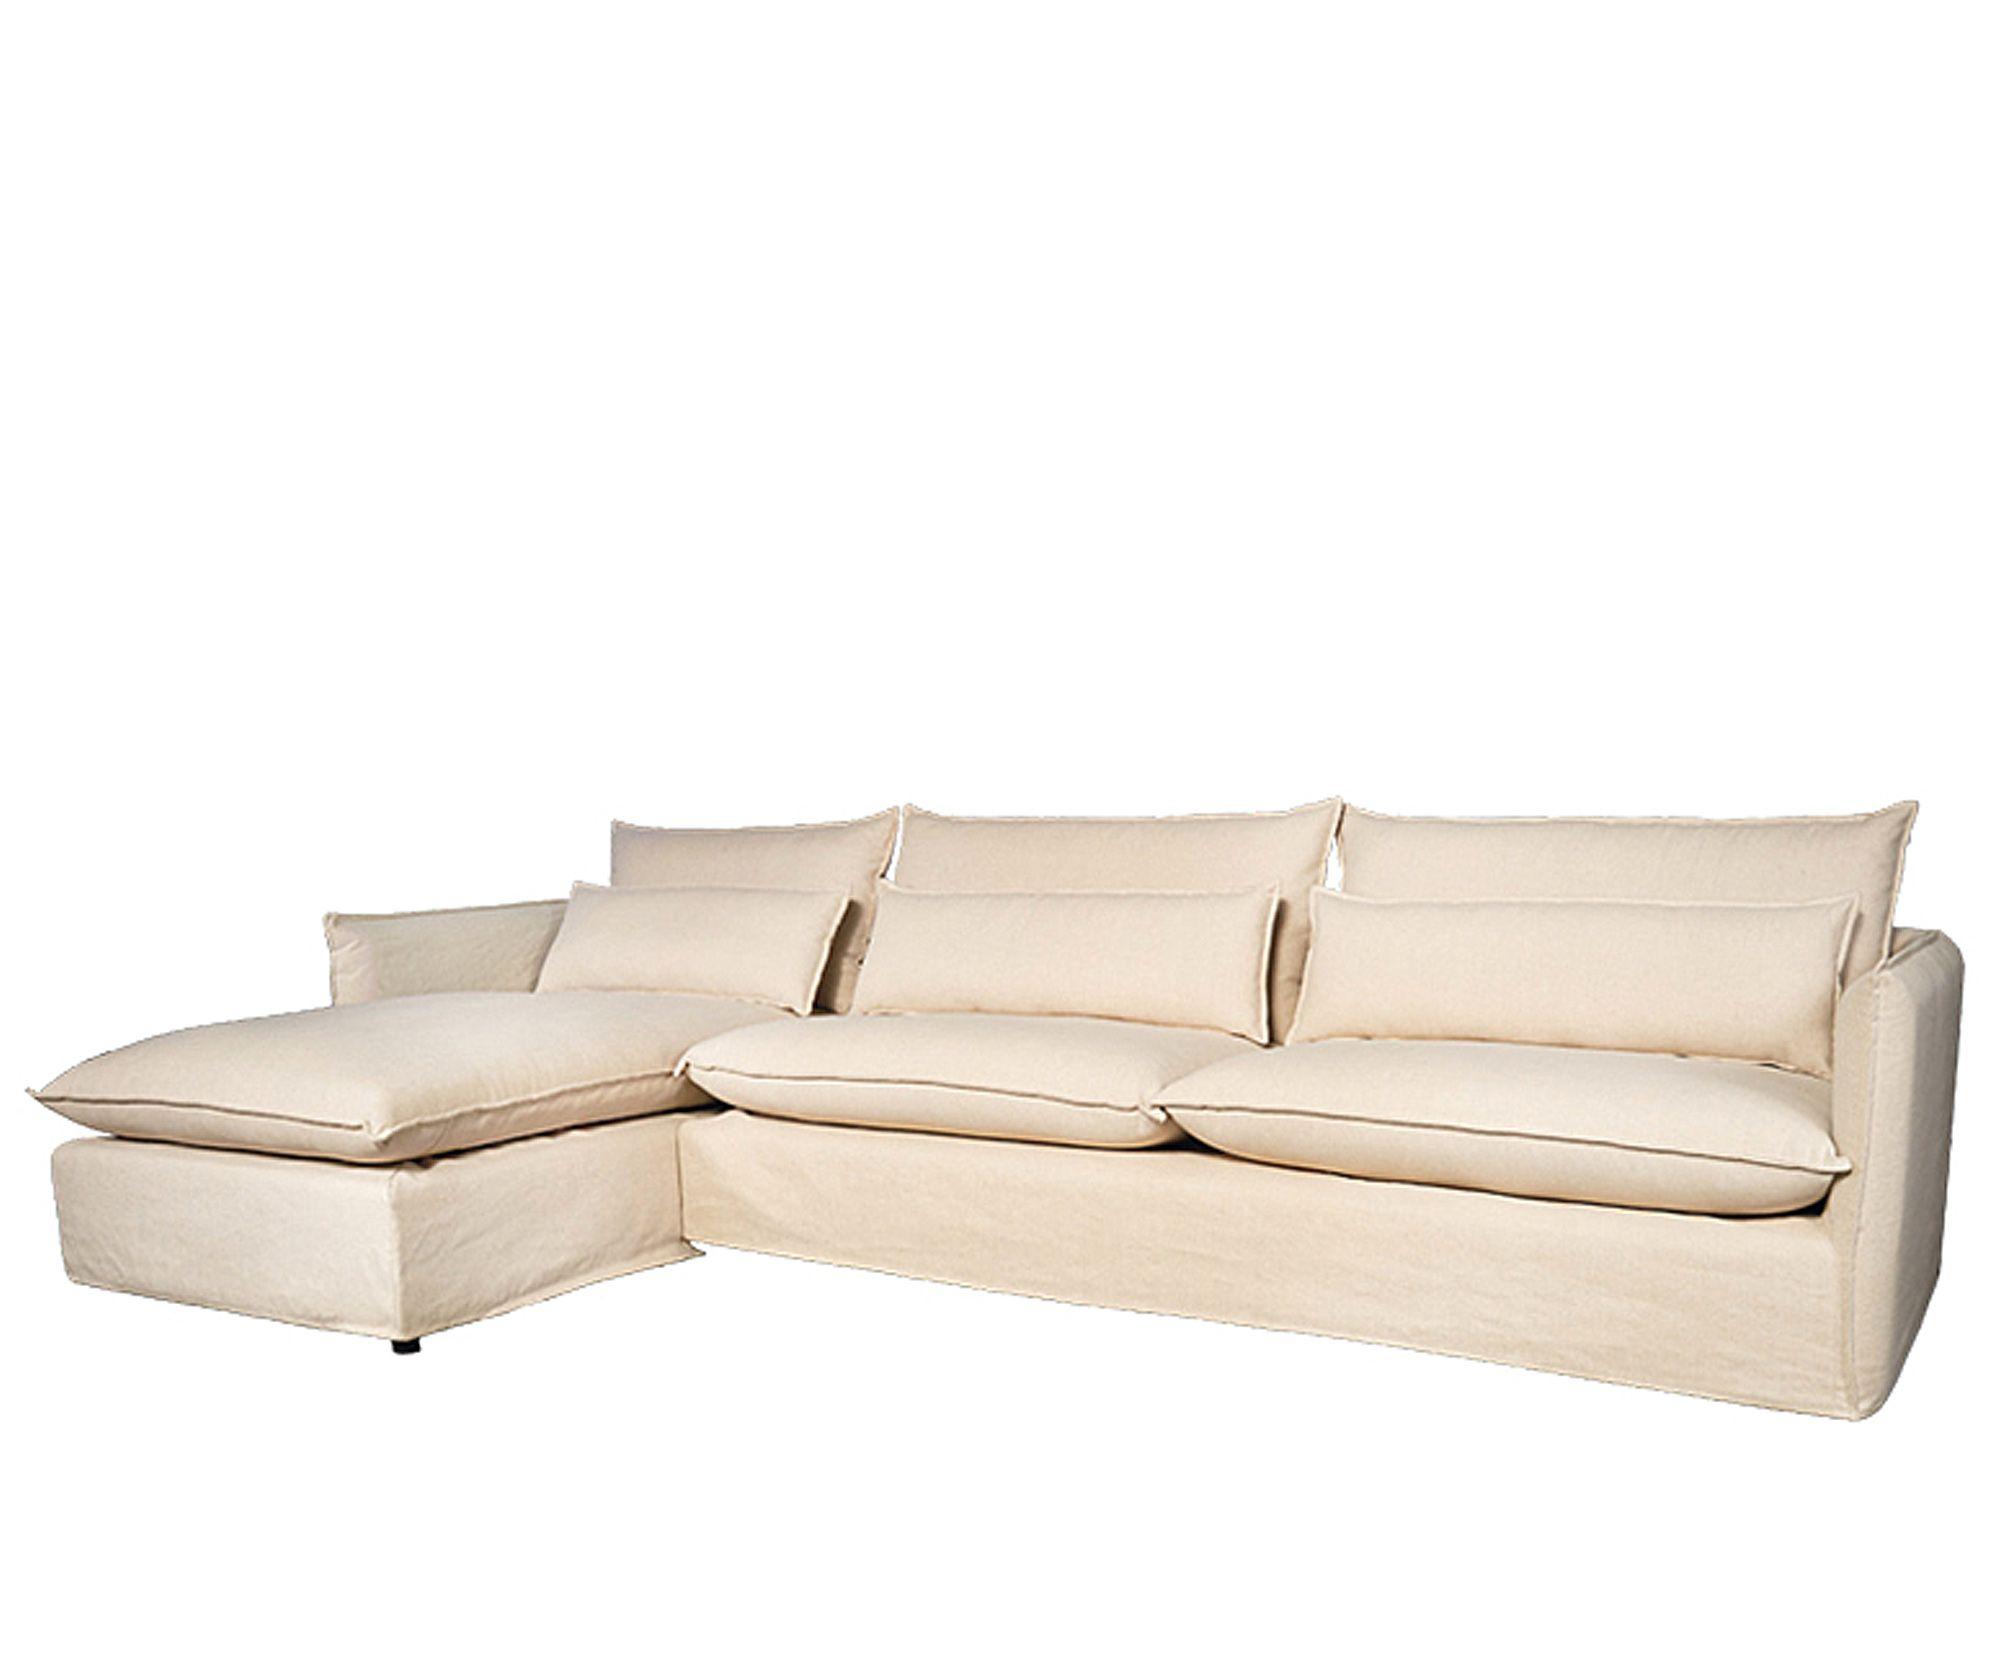 Zandkleurig Leren Bankstel.Lifestyle Vicenza Lounnge Sofa Left Zandkleur Hoekbank Hoekbank